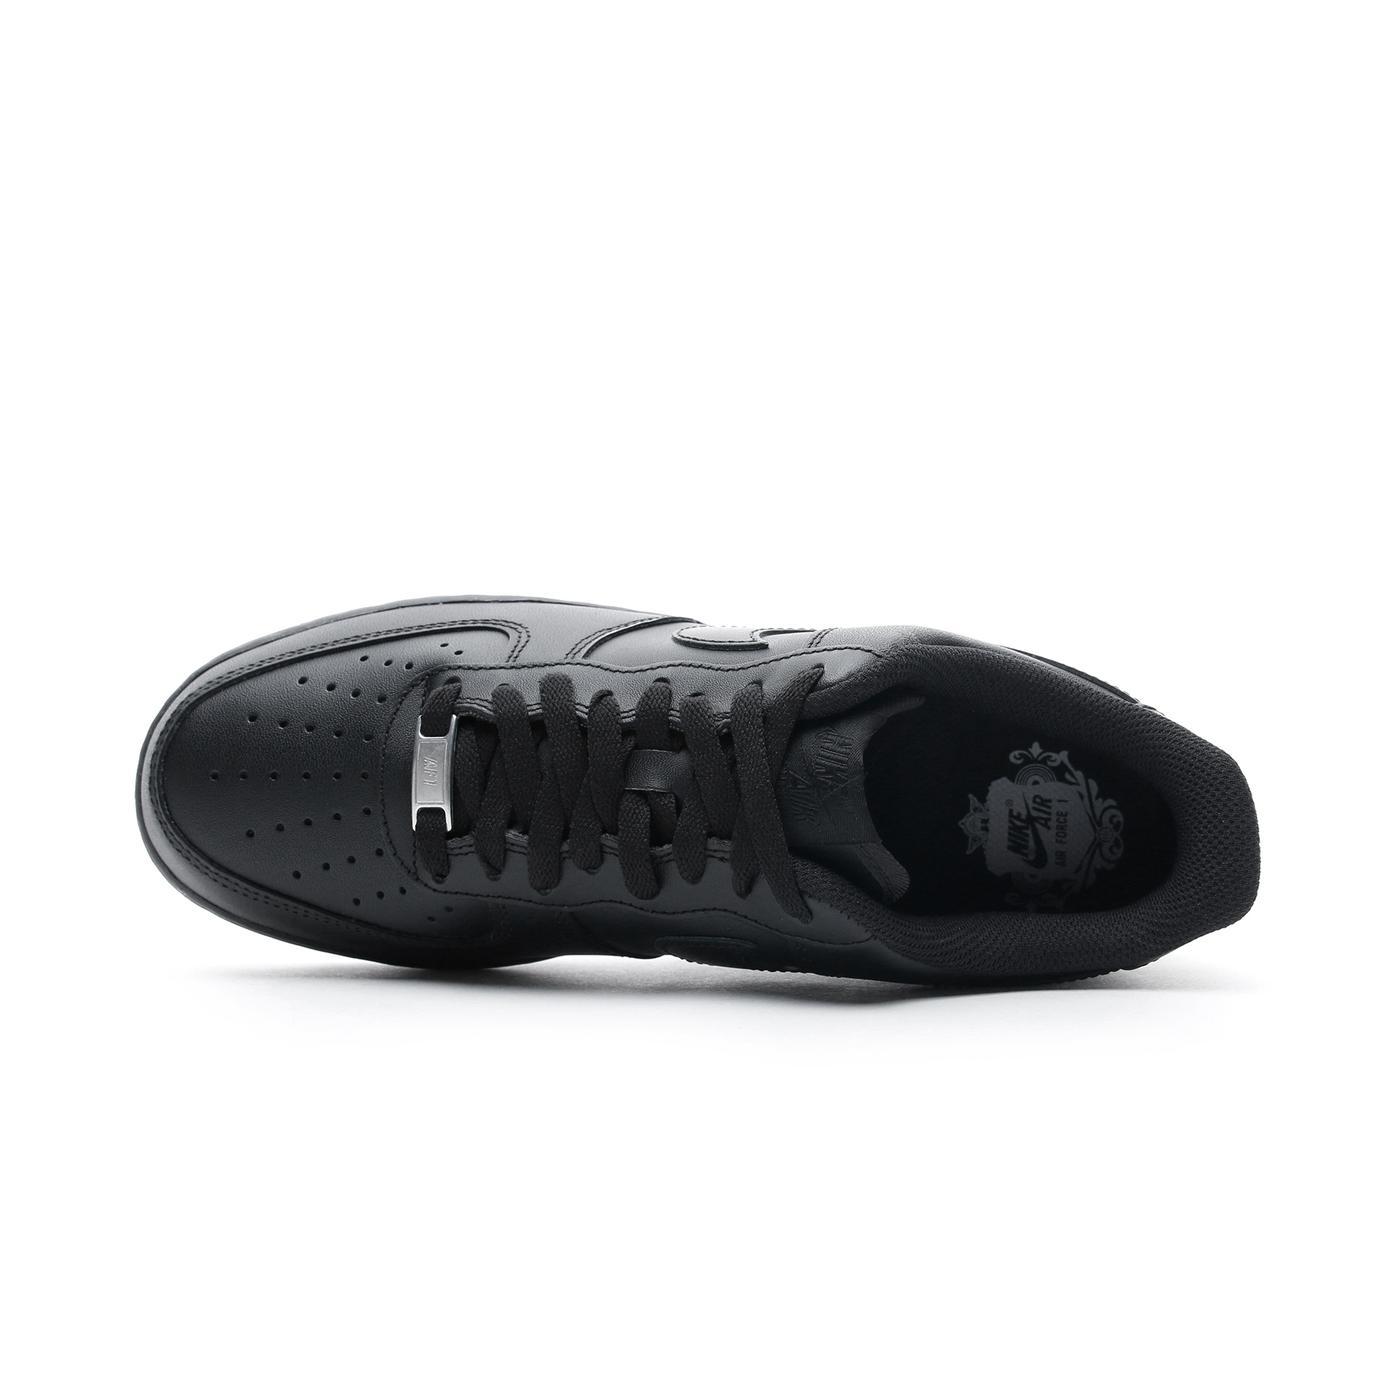 Nike Air Force 1 07 Unisex Siyah Spor Ayakkabı